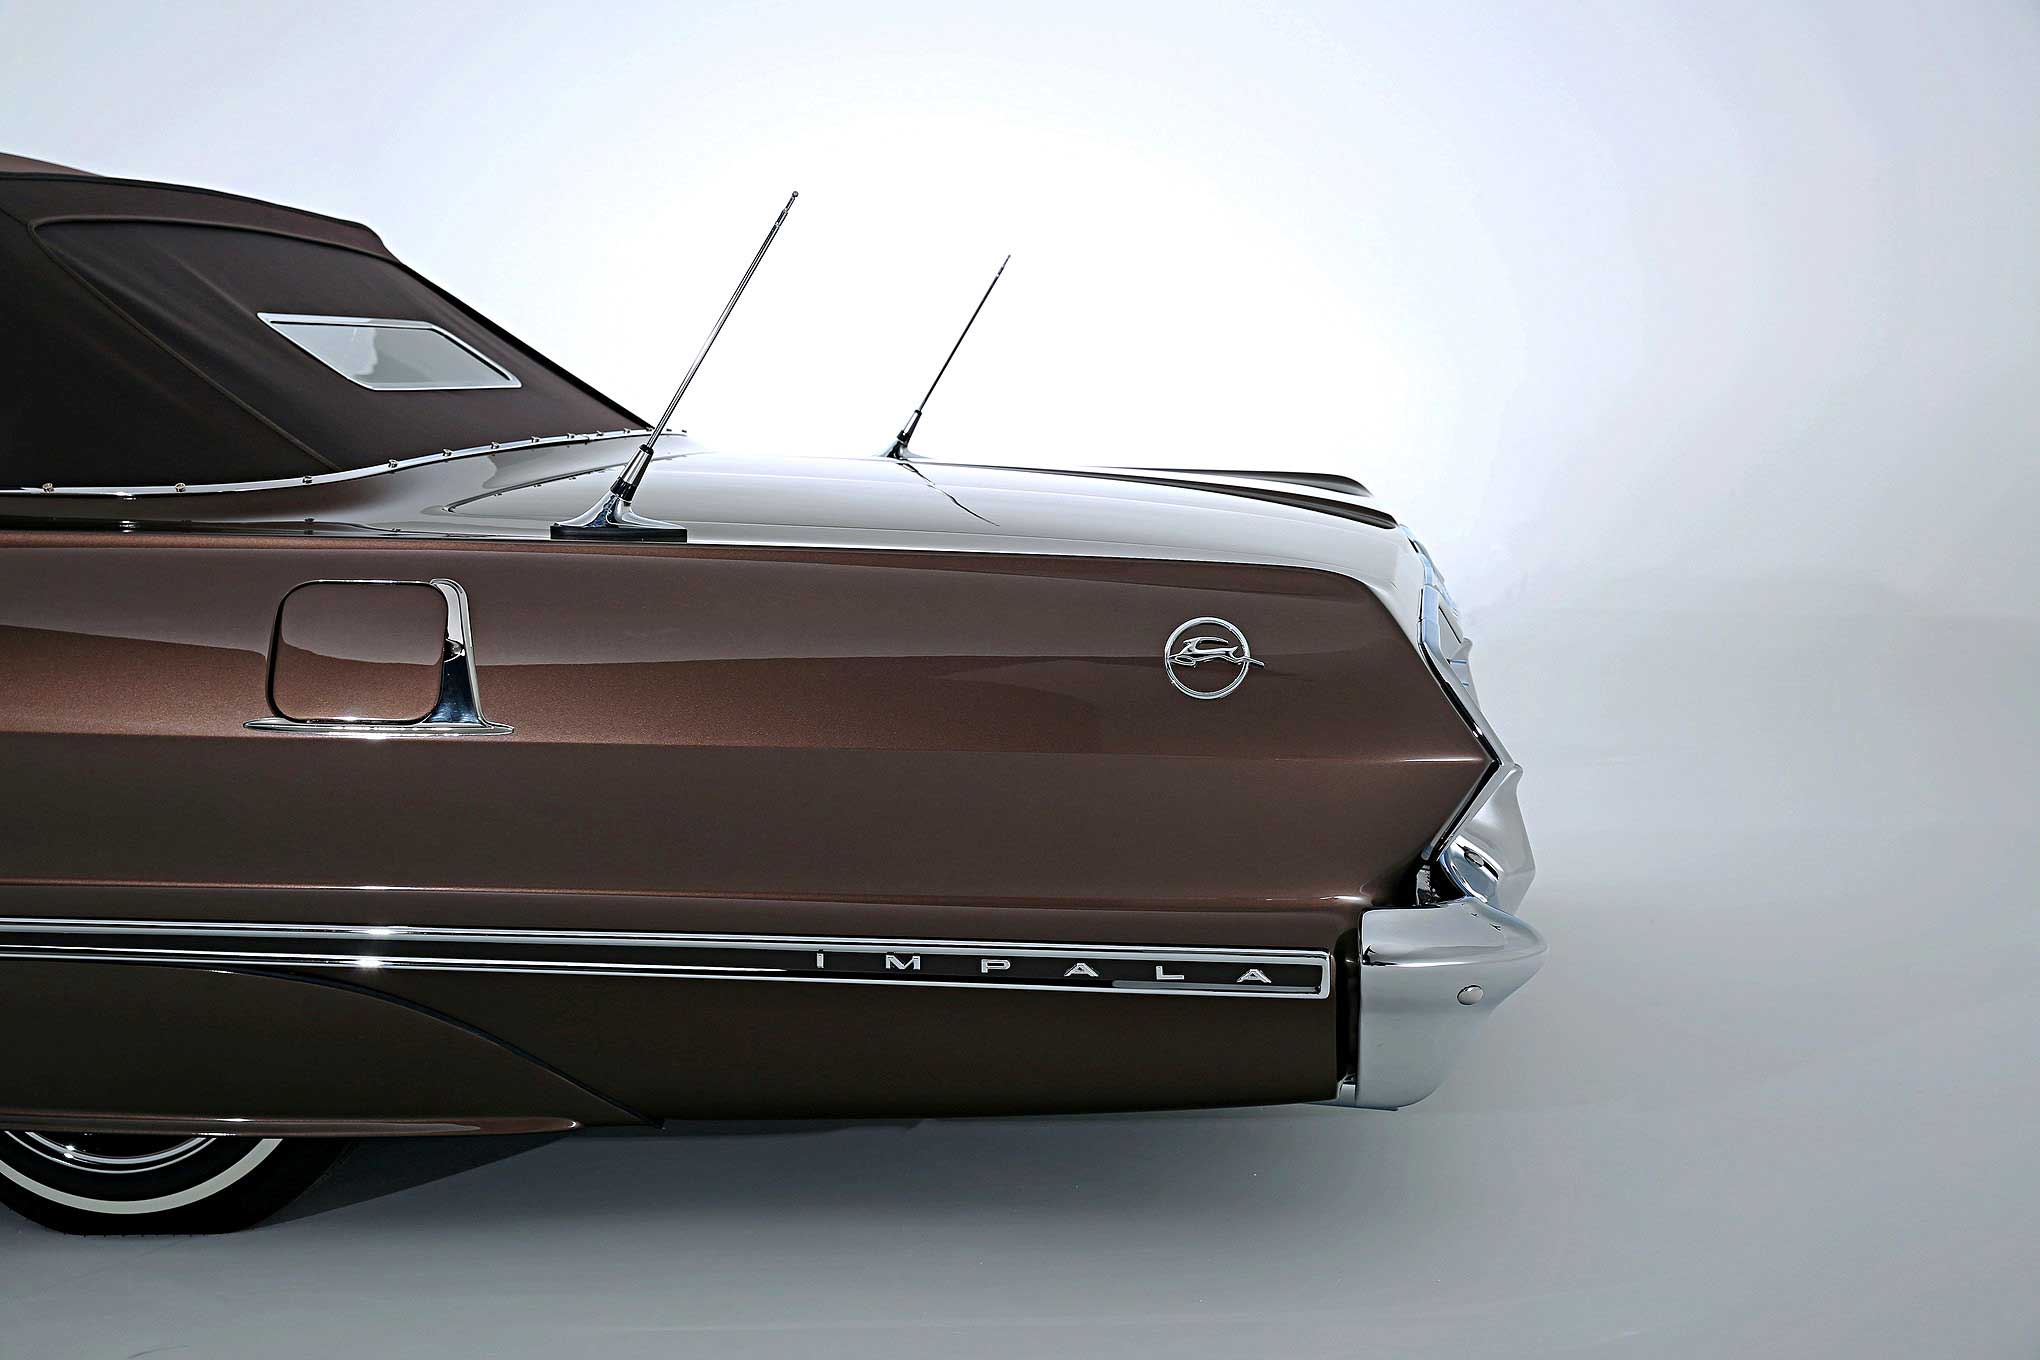 1963 Chevrolet Impala Convertible Taking Flight